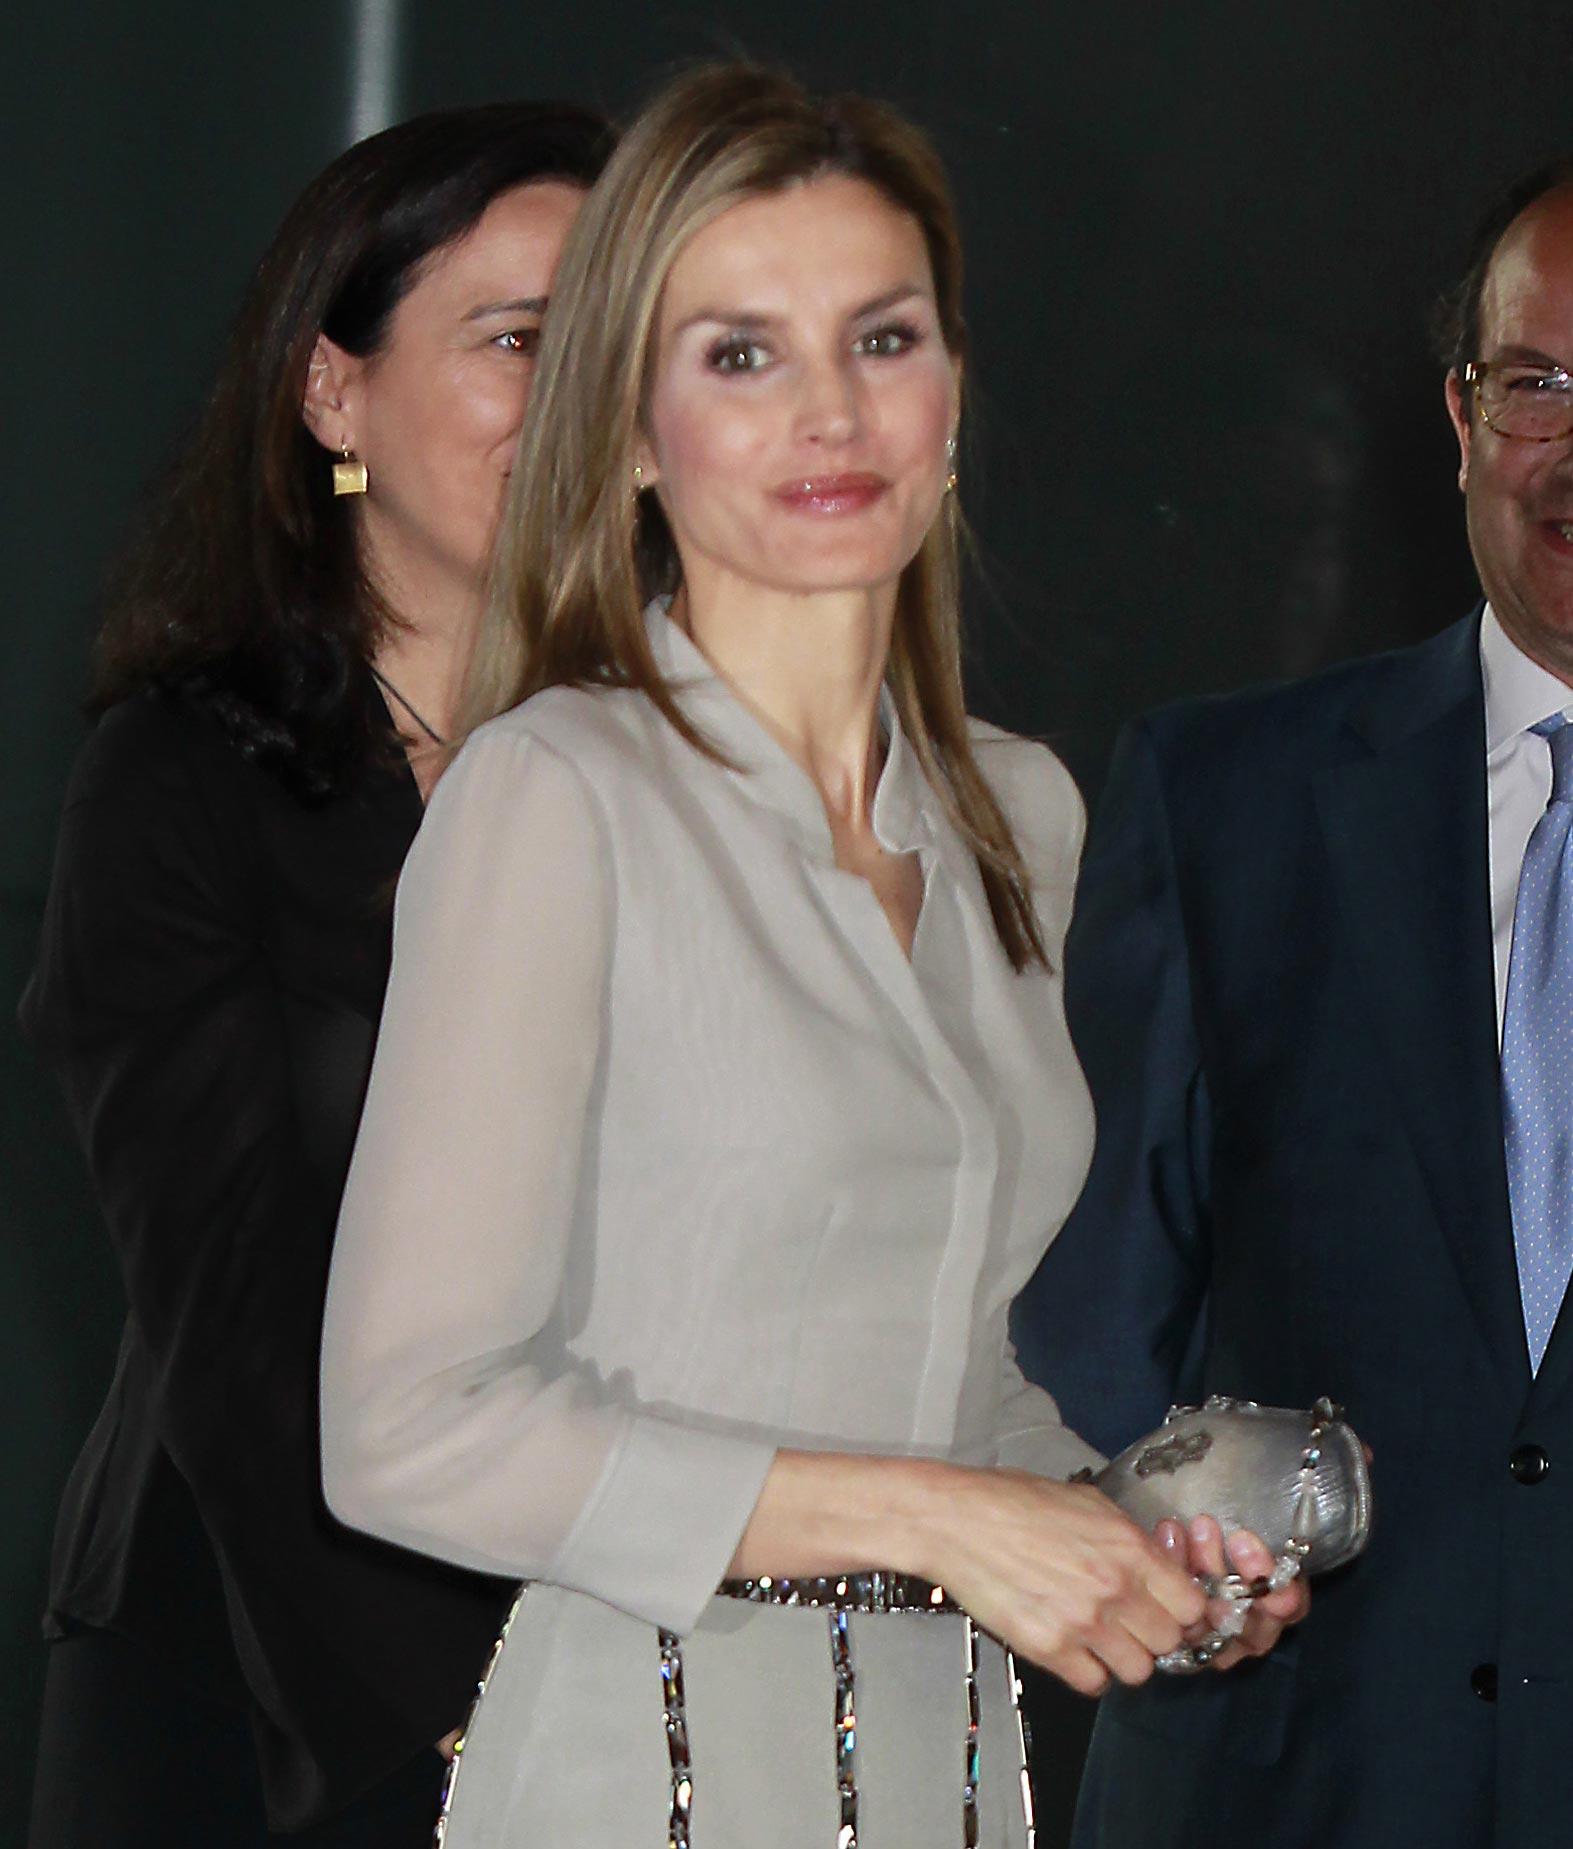 La futura reina Letizia muestra su apoyo a la moda española